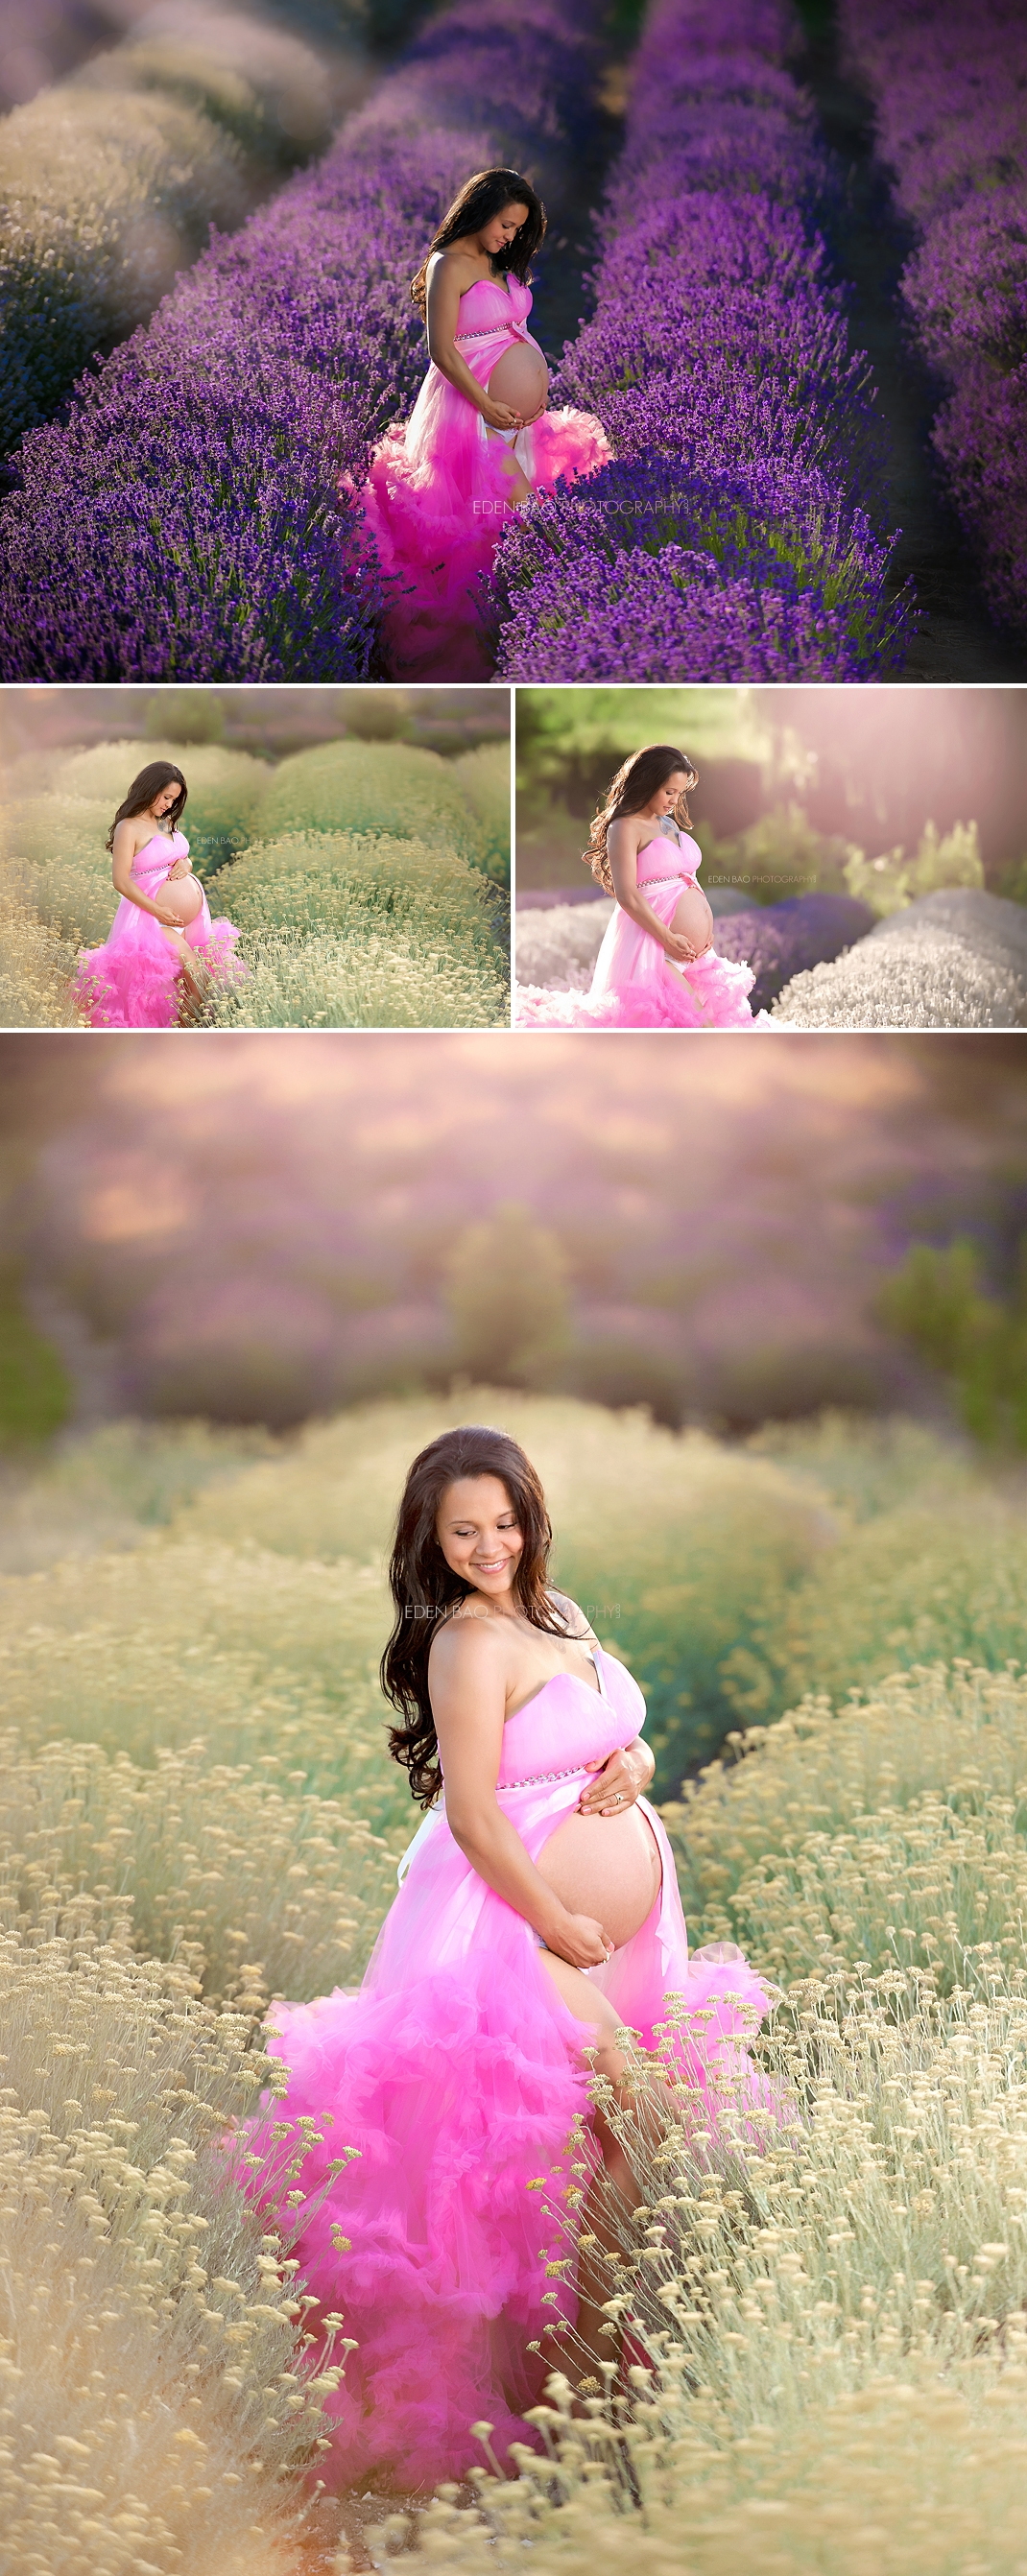 Best Maternity Photographer lavender field